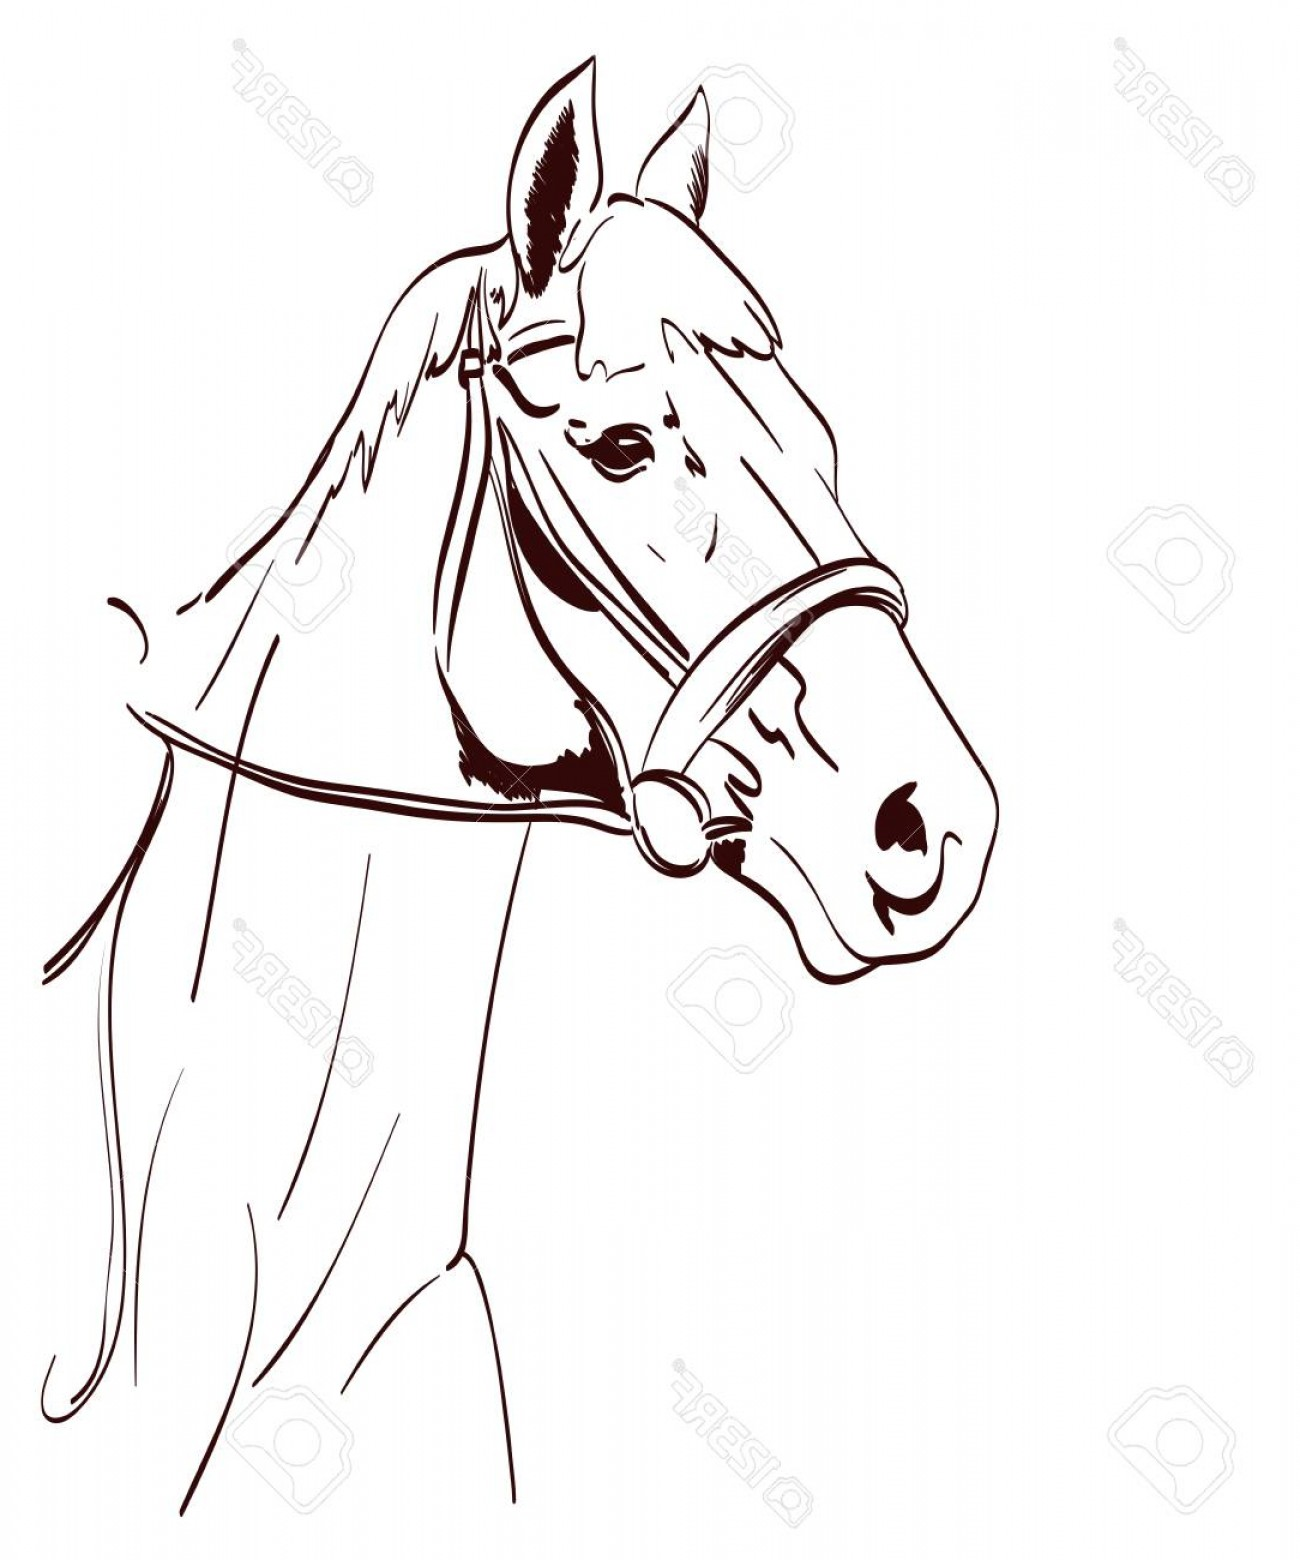 1300x1560 Photostock Vector Horse Head Vector Illustration In Line Art Style